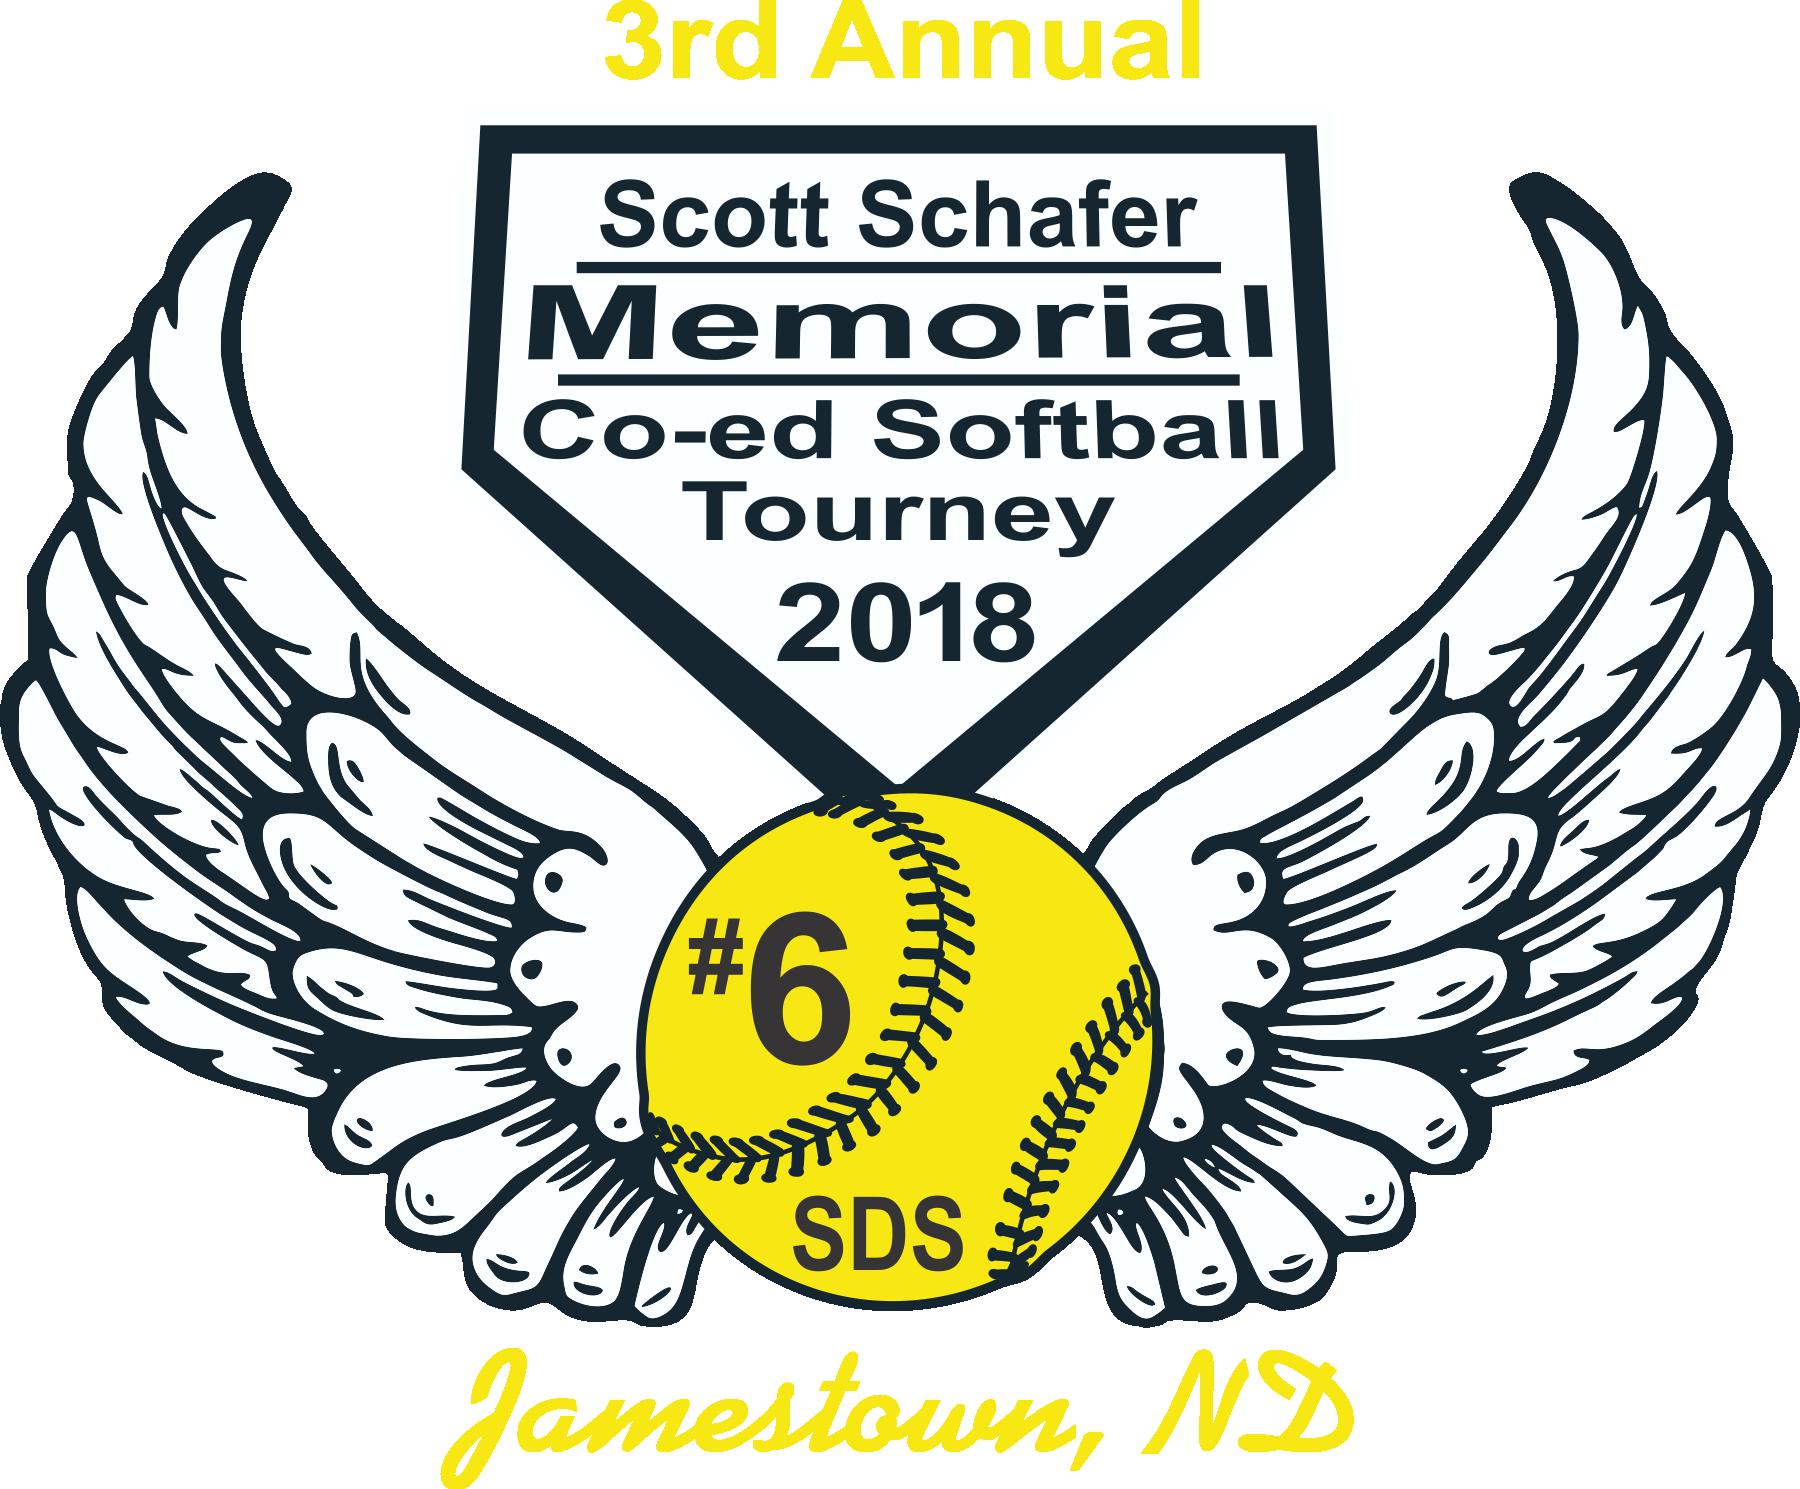 schafer-memorial-softball-18-logo.png